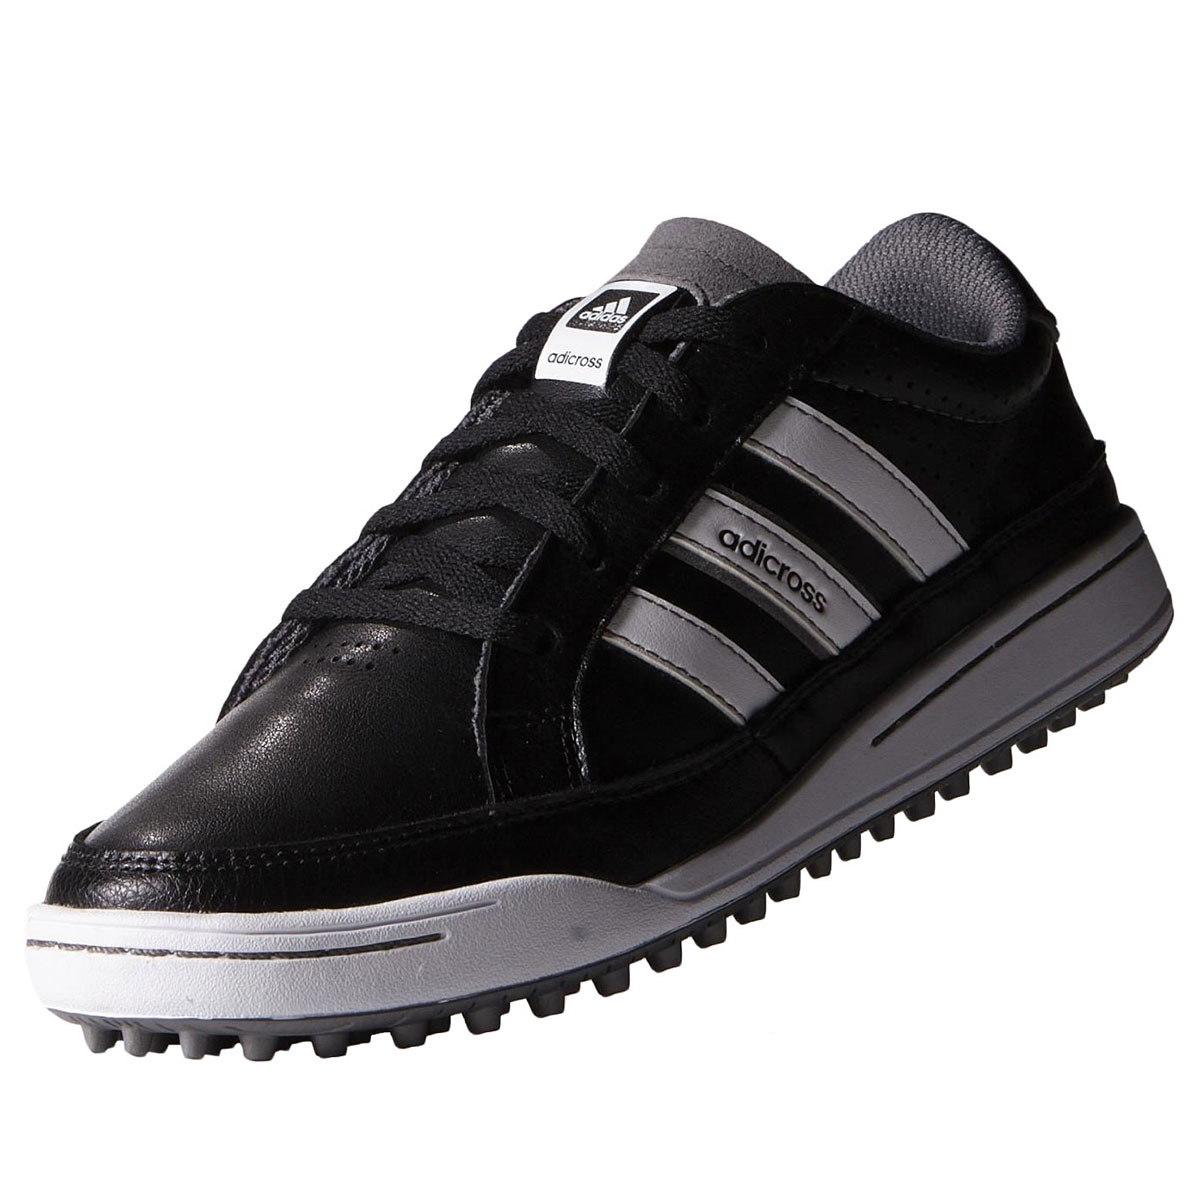 Adidas Golf Shoes Adicross Iv